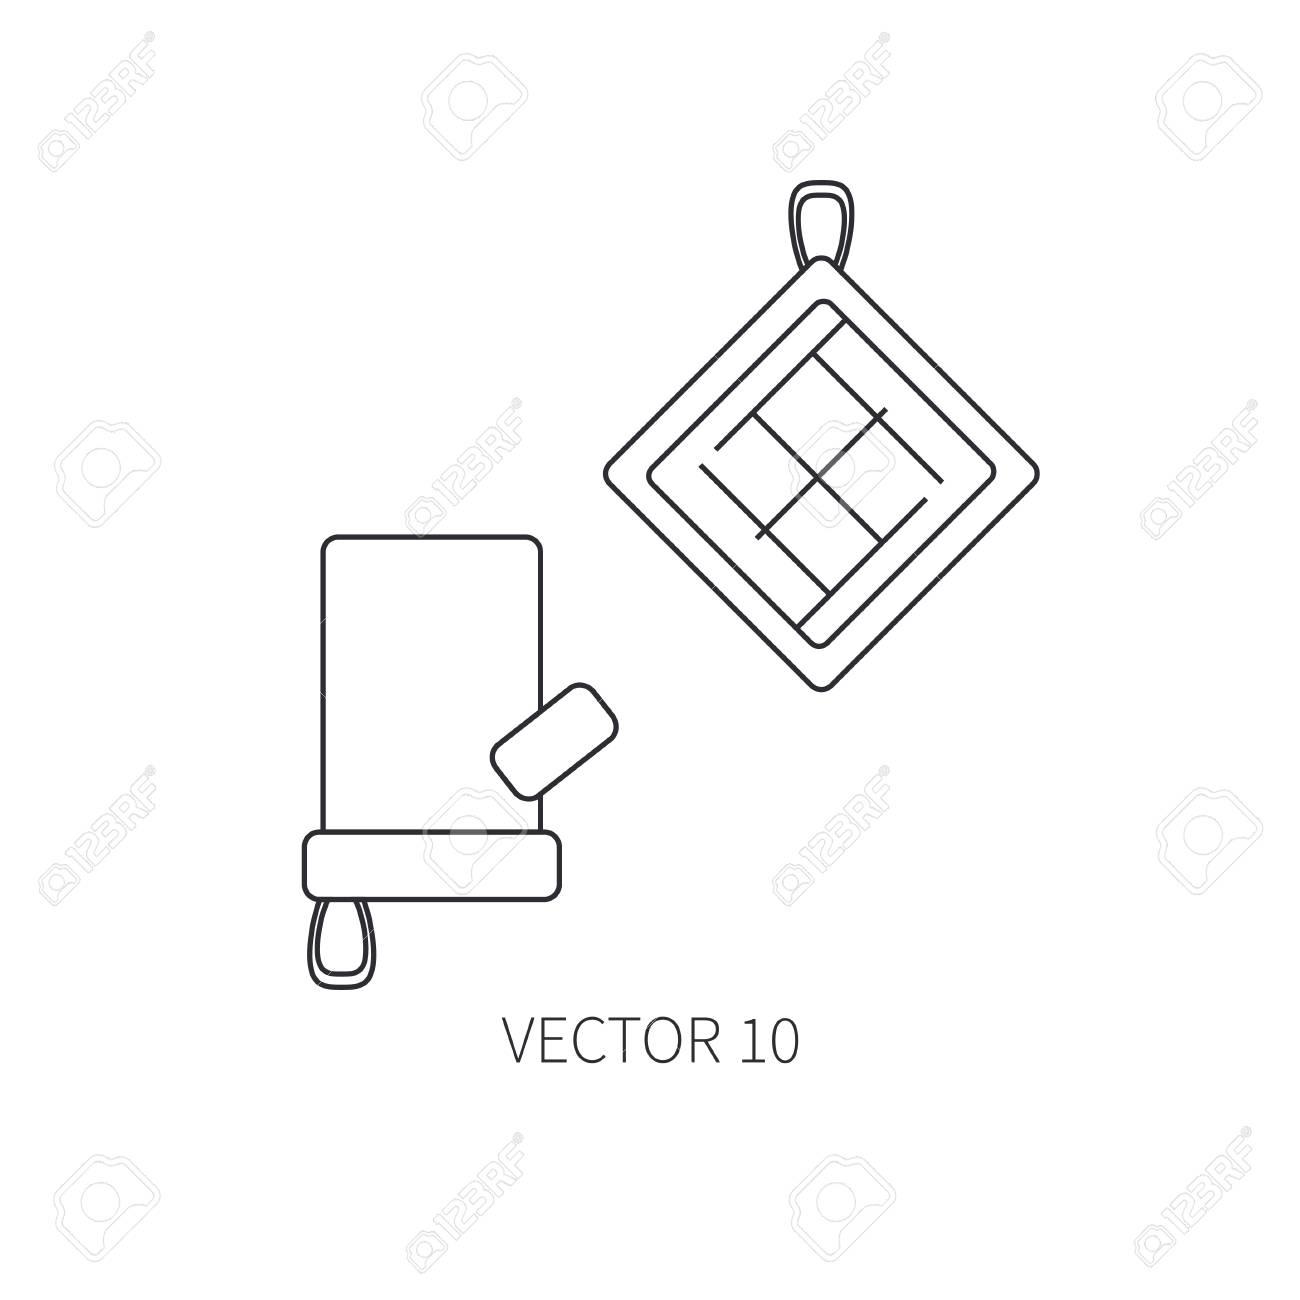 Iconos De Vector Línea Plana Utensilios De Cocina - Horno-guante ...